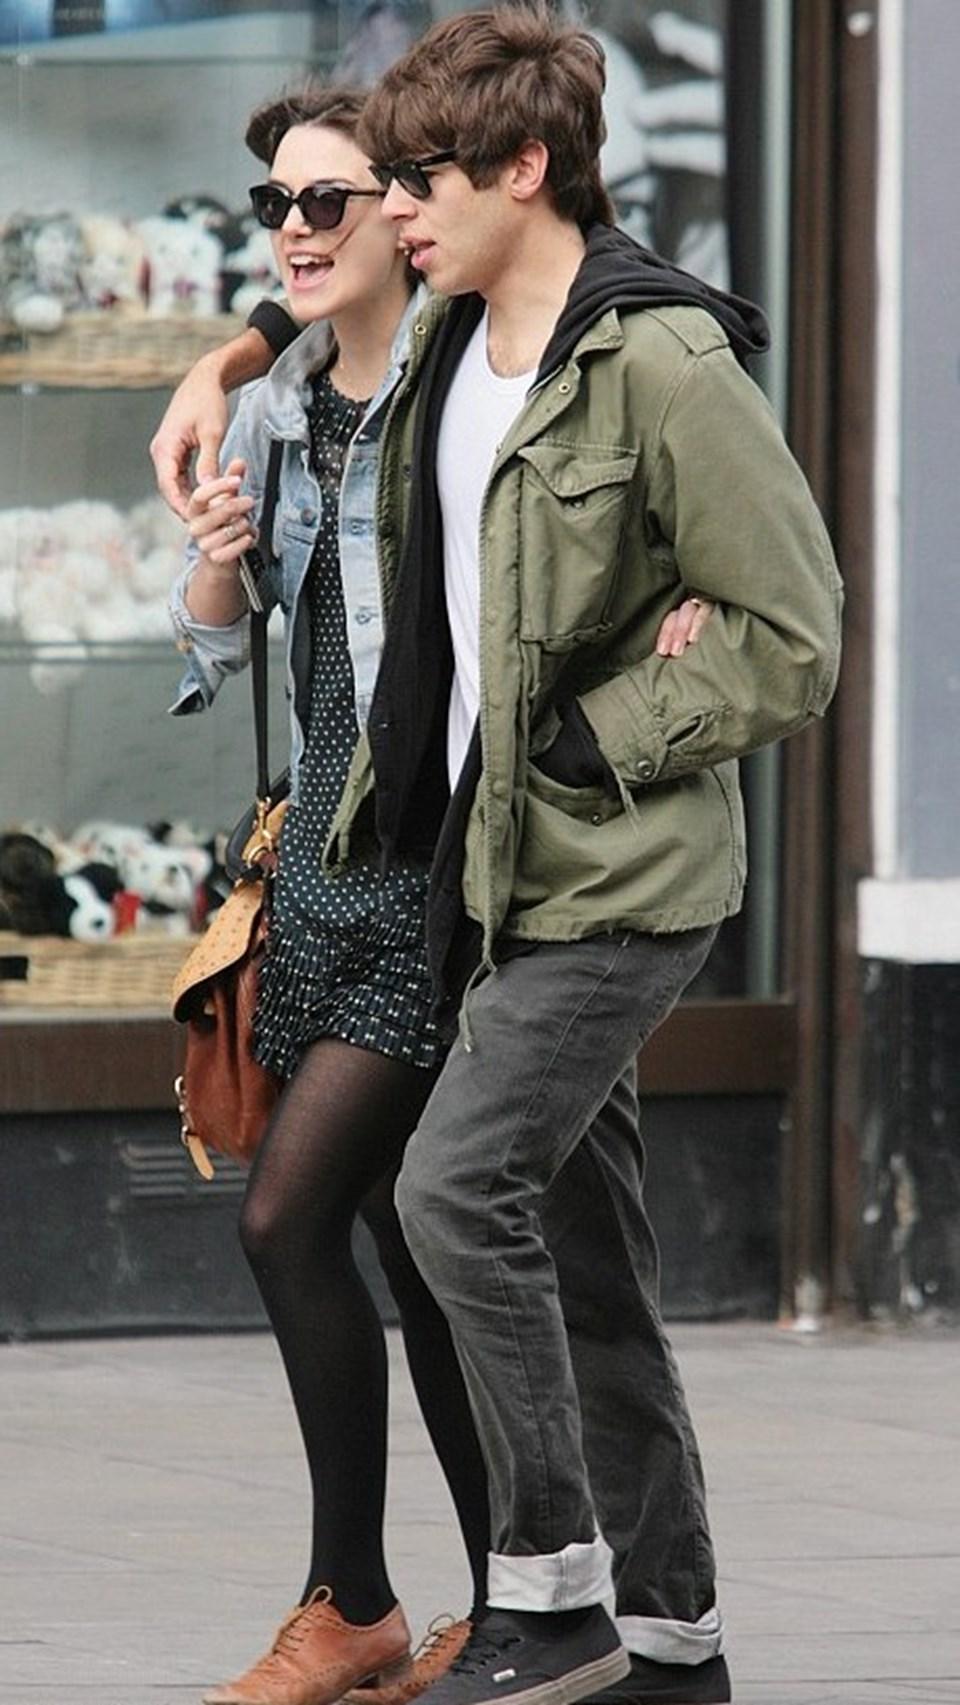 Keira Knightley ve Rupert Friend